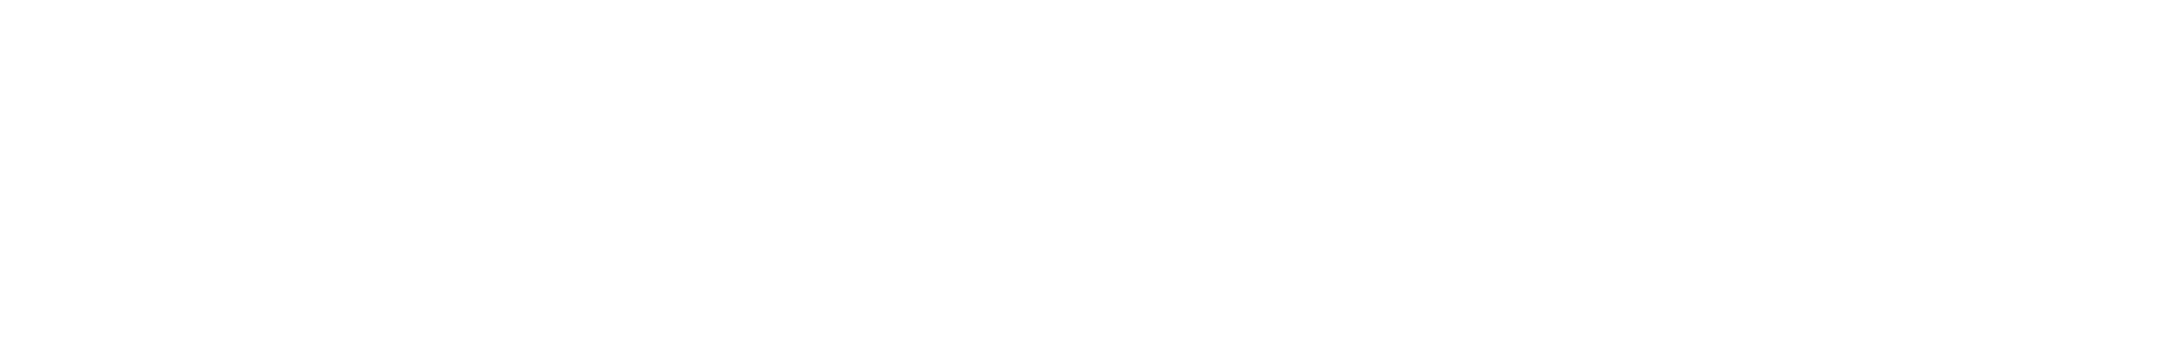 FreightWaves-Communities_White-Logo